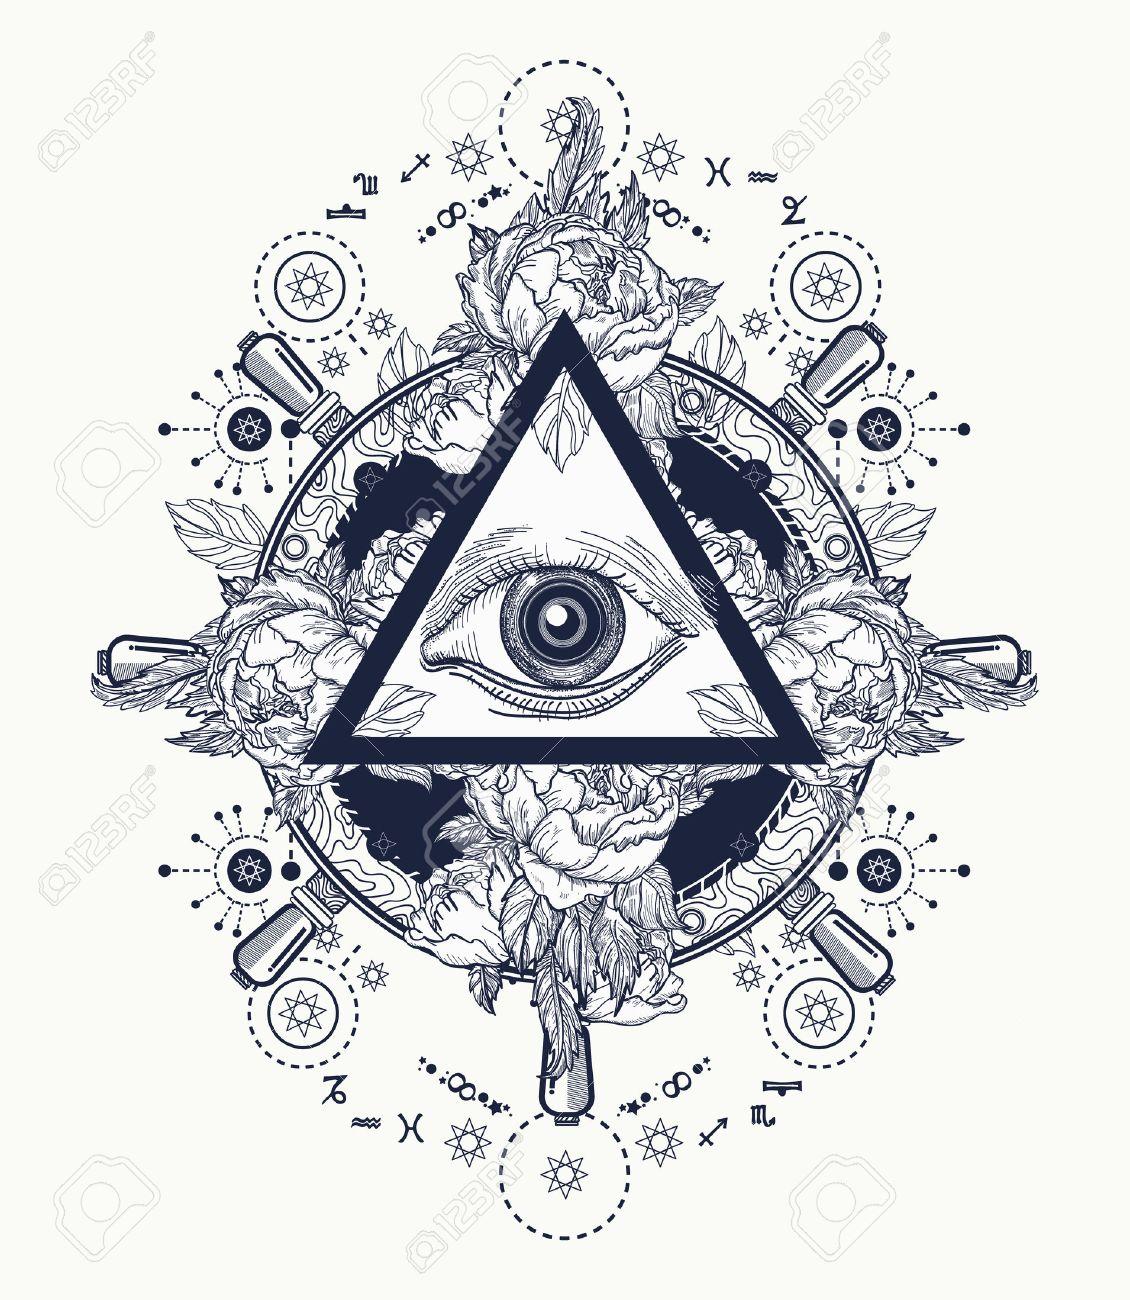 All seeing eye pyramid tattoo art freemason and spiritual symbols all seeing eye pyramid tattoo art freemason and spiritual symbols alchemy medieval religion buycottarizona Images